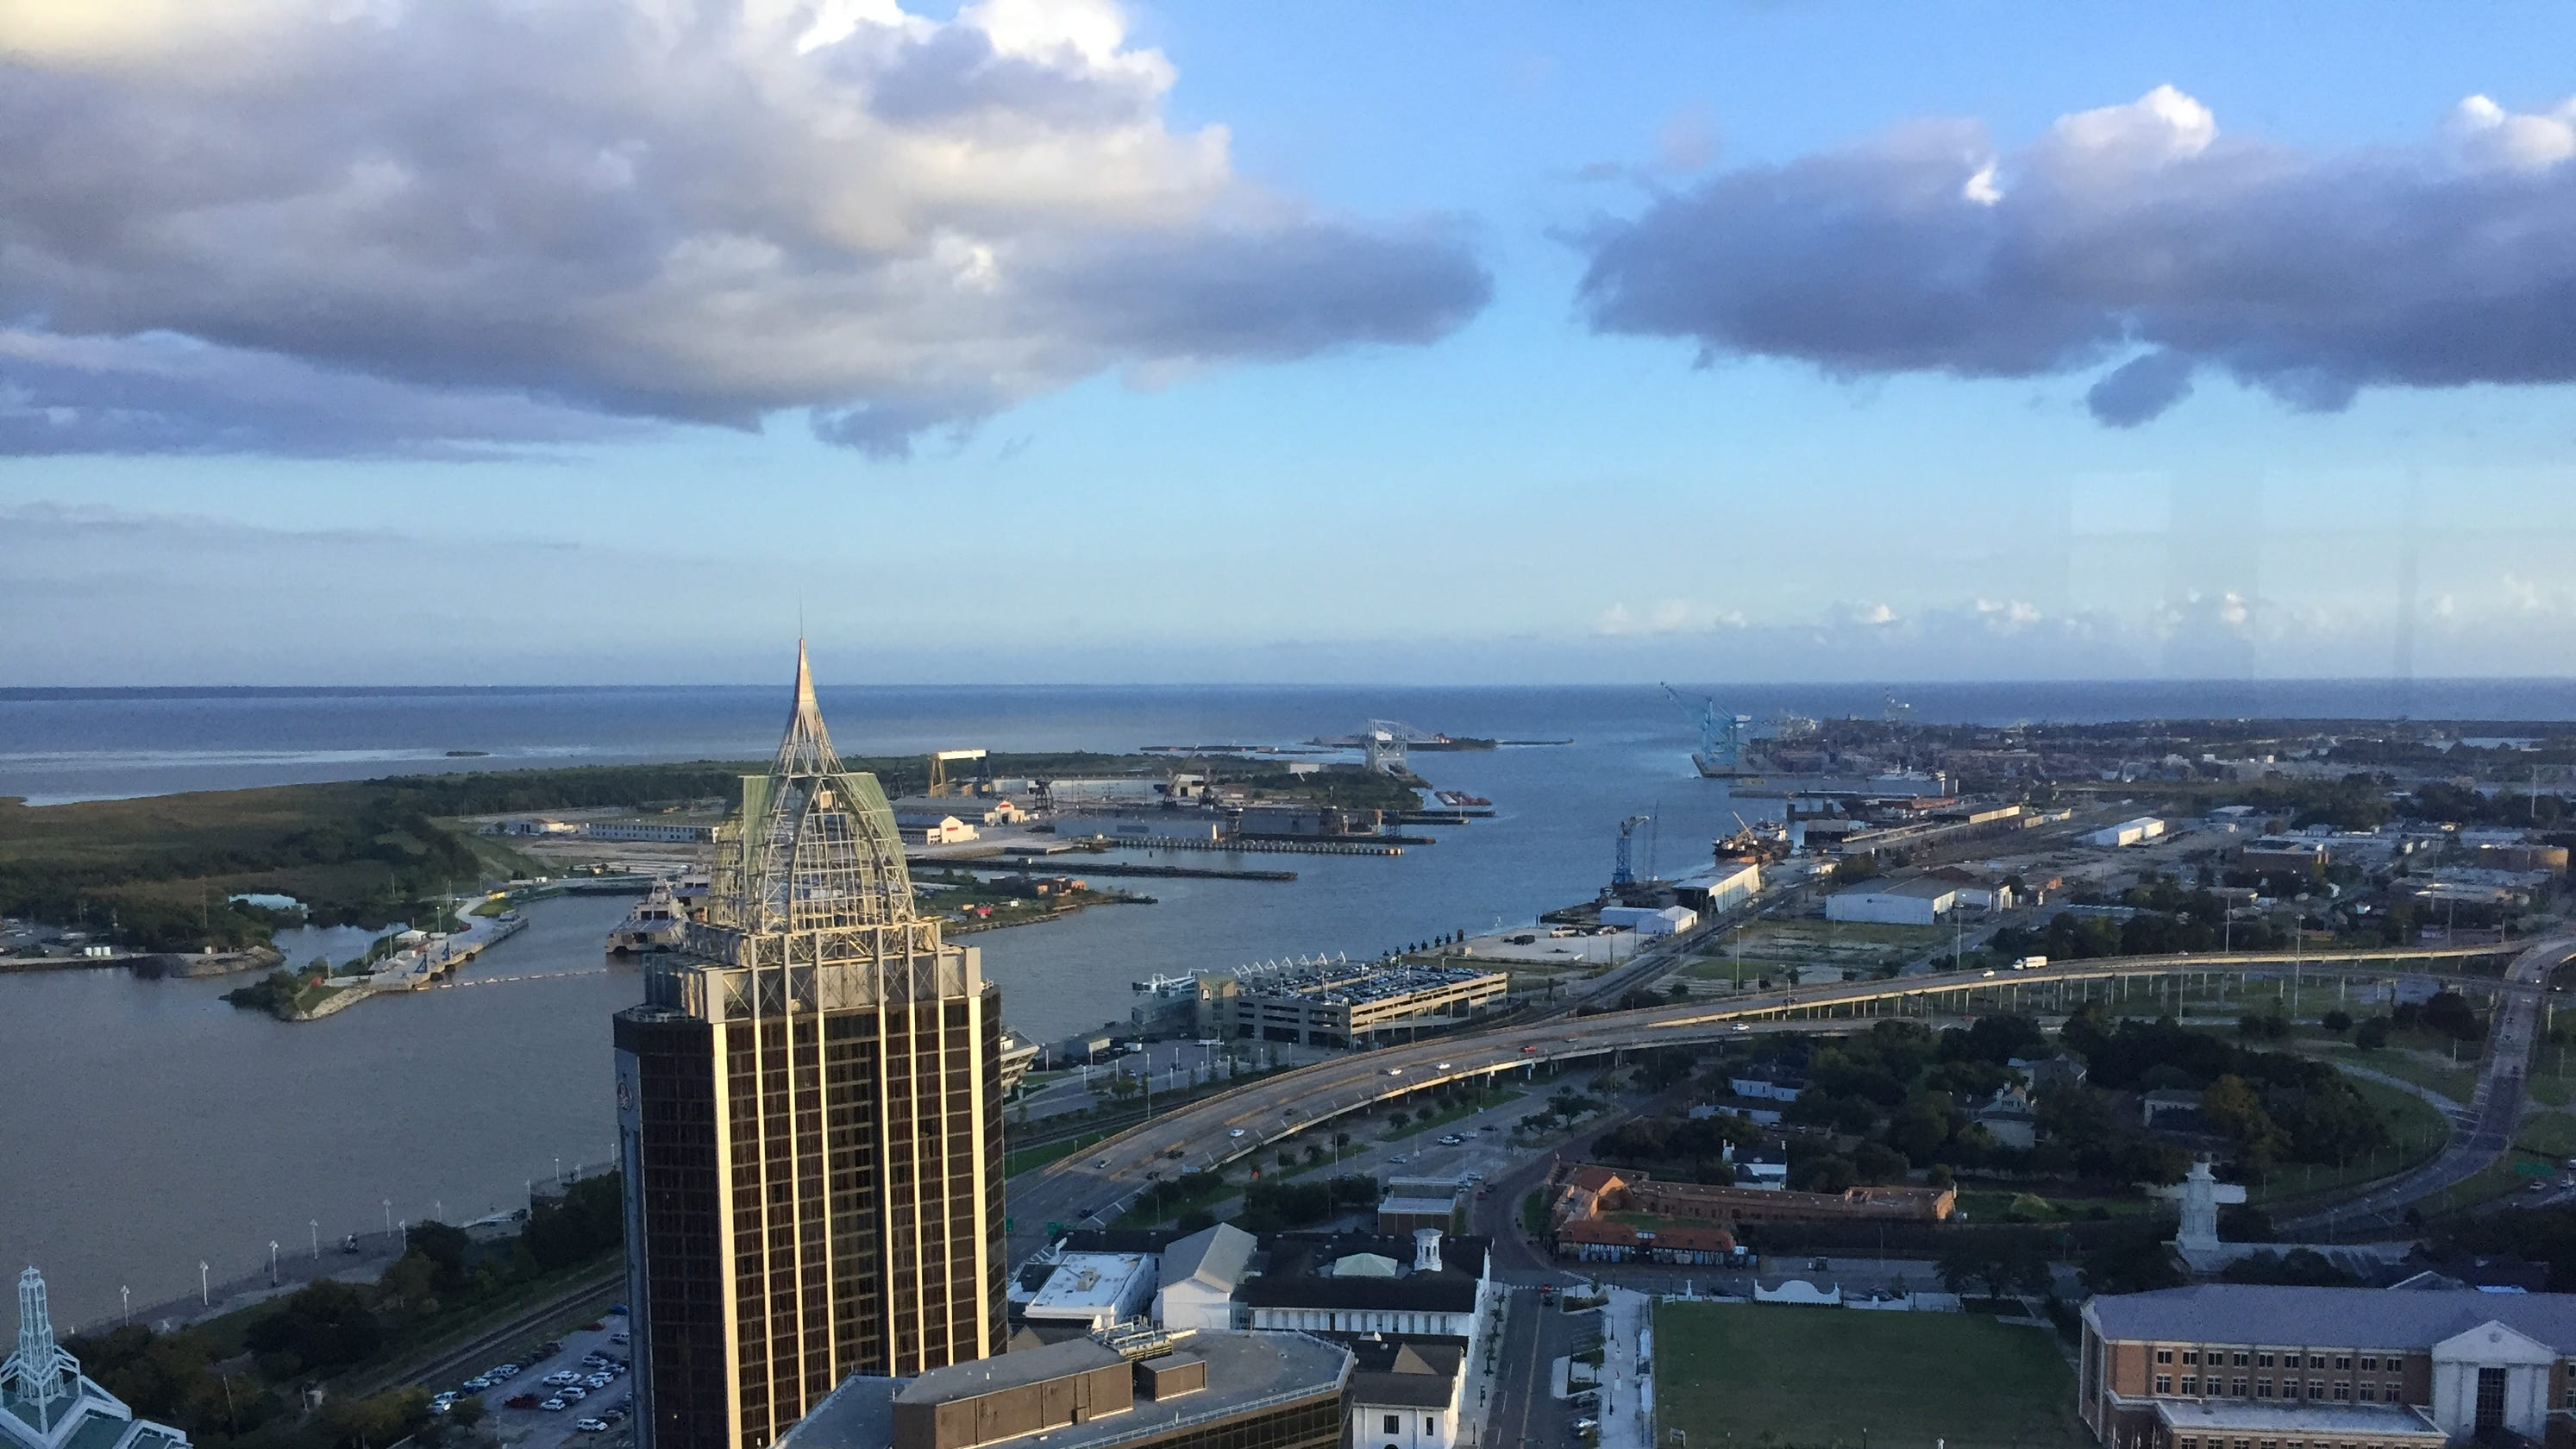 Mobile, Alabama travel guide: Outdoors, music, restaurants